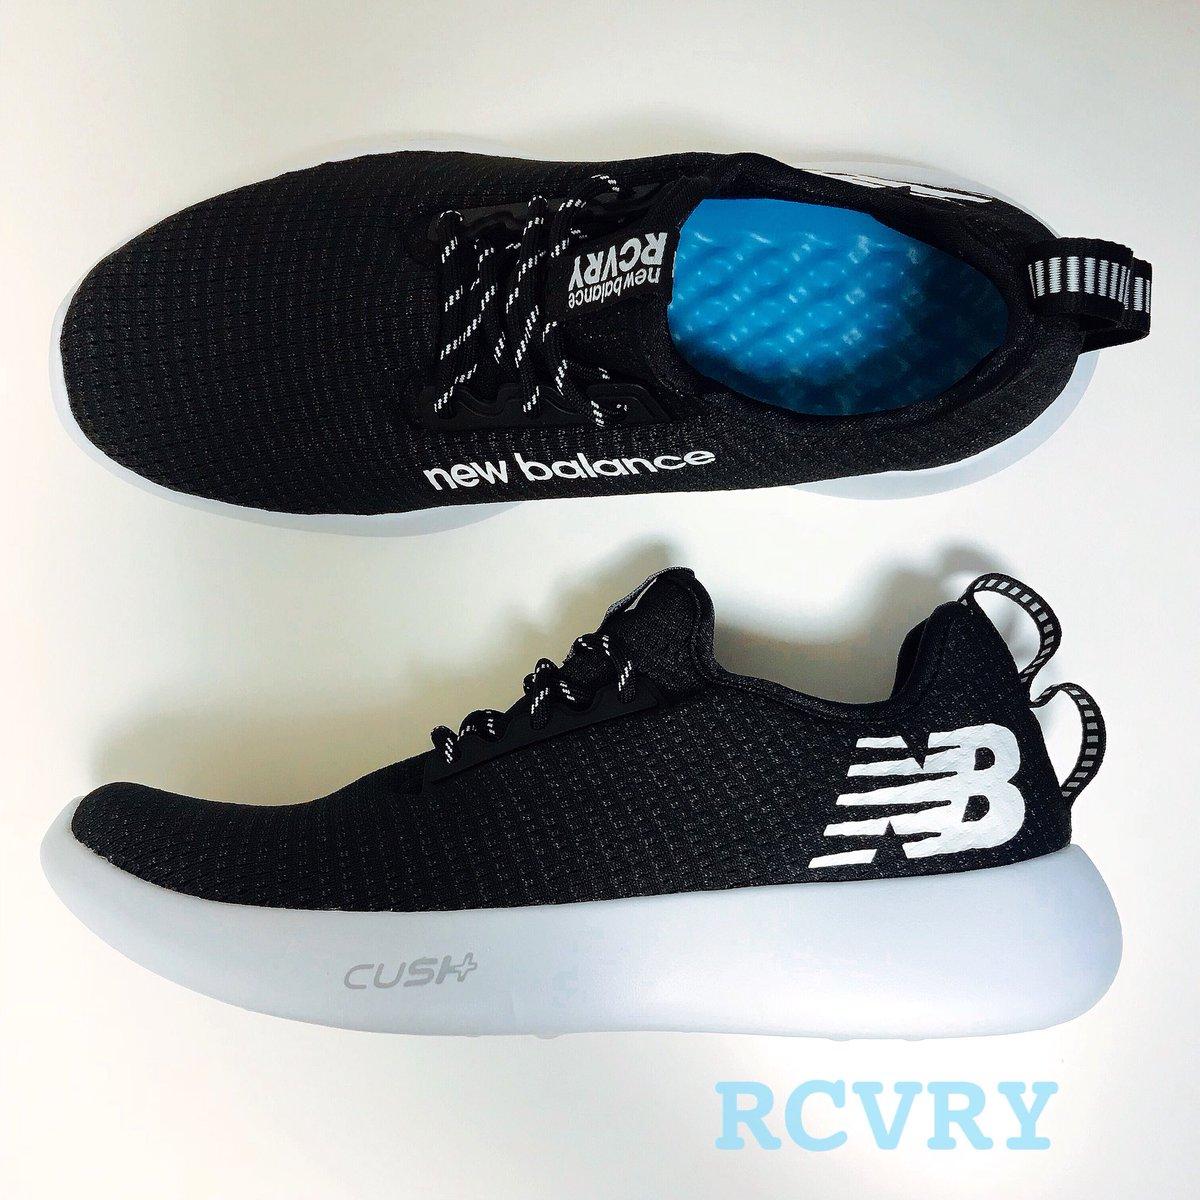 New Balance Slip-on Light, Comfortable, Machine-washable  #RCVRY #NewBalance #NB #リカバリー #ニューバランス #kicks #sneaker #slipon #スニーカー #スリッポン #WhereIStand #足元くらぶ #足元クラブ #足元倶楽部pic.twitter.com/iVDgyGr226